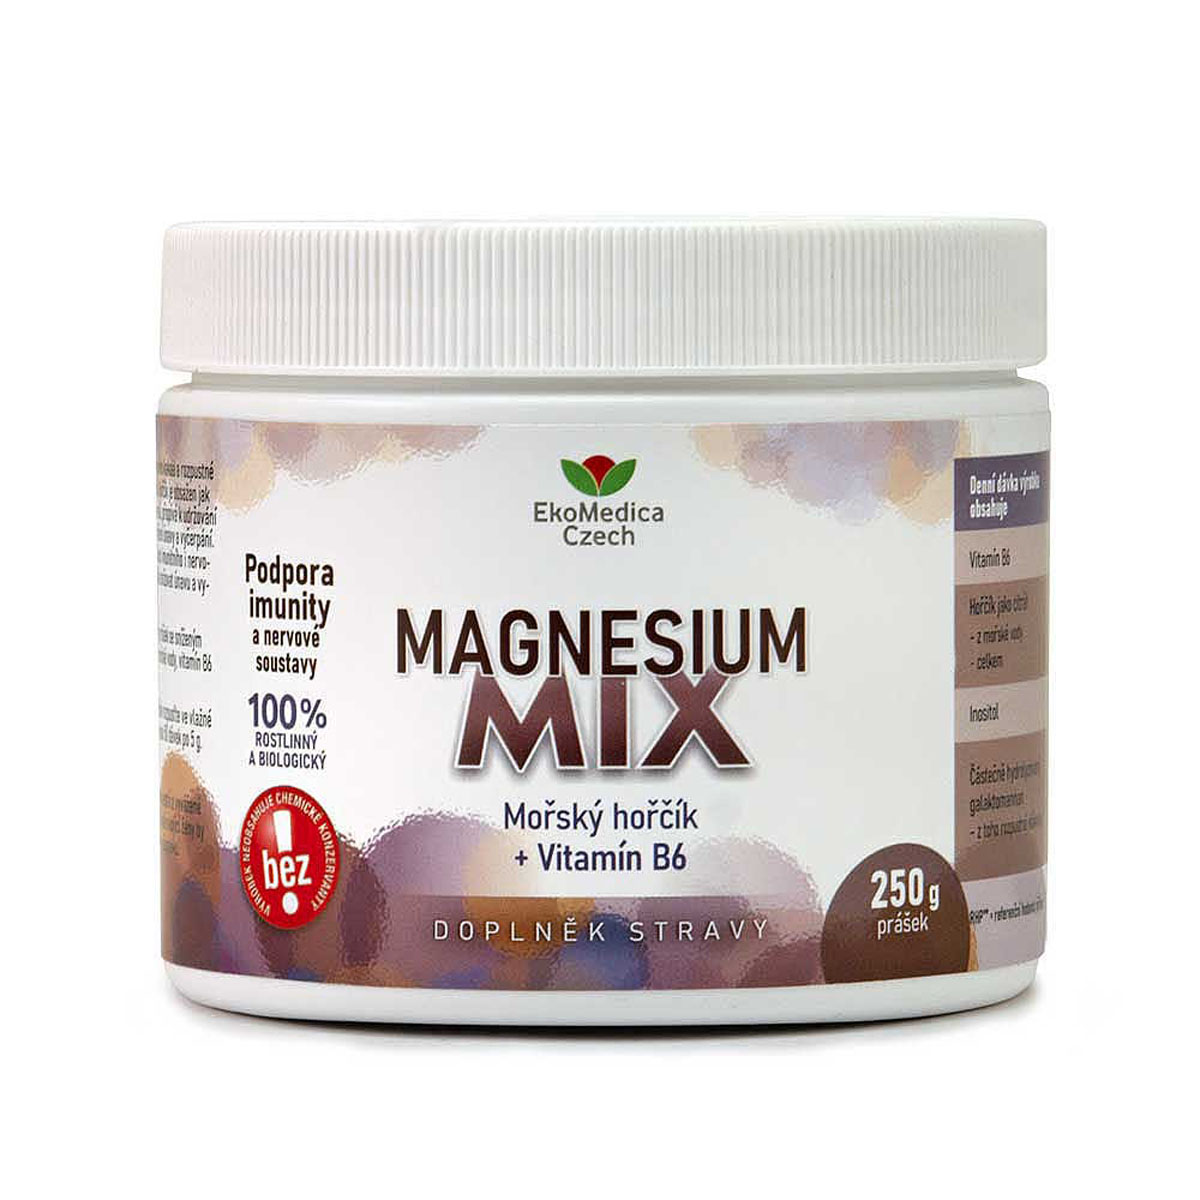 EkoMedica Magnesium mix 250 g